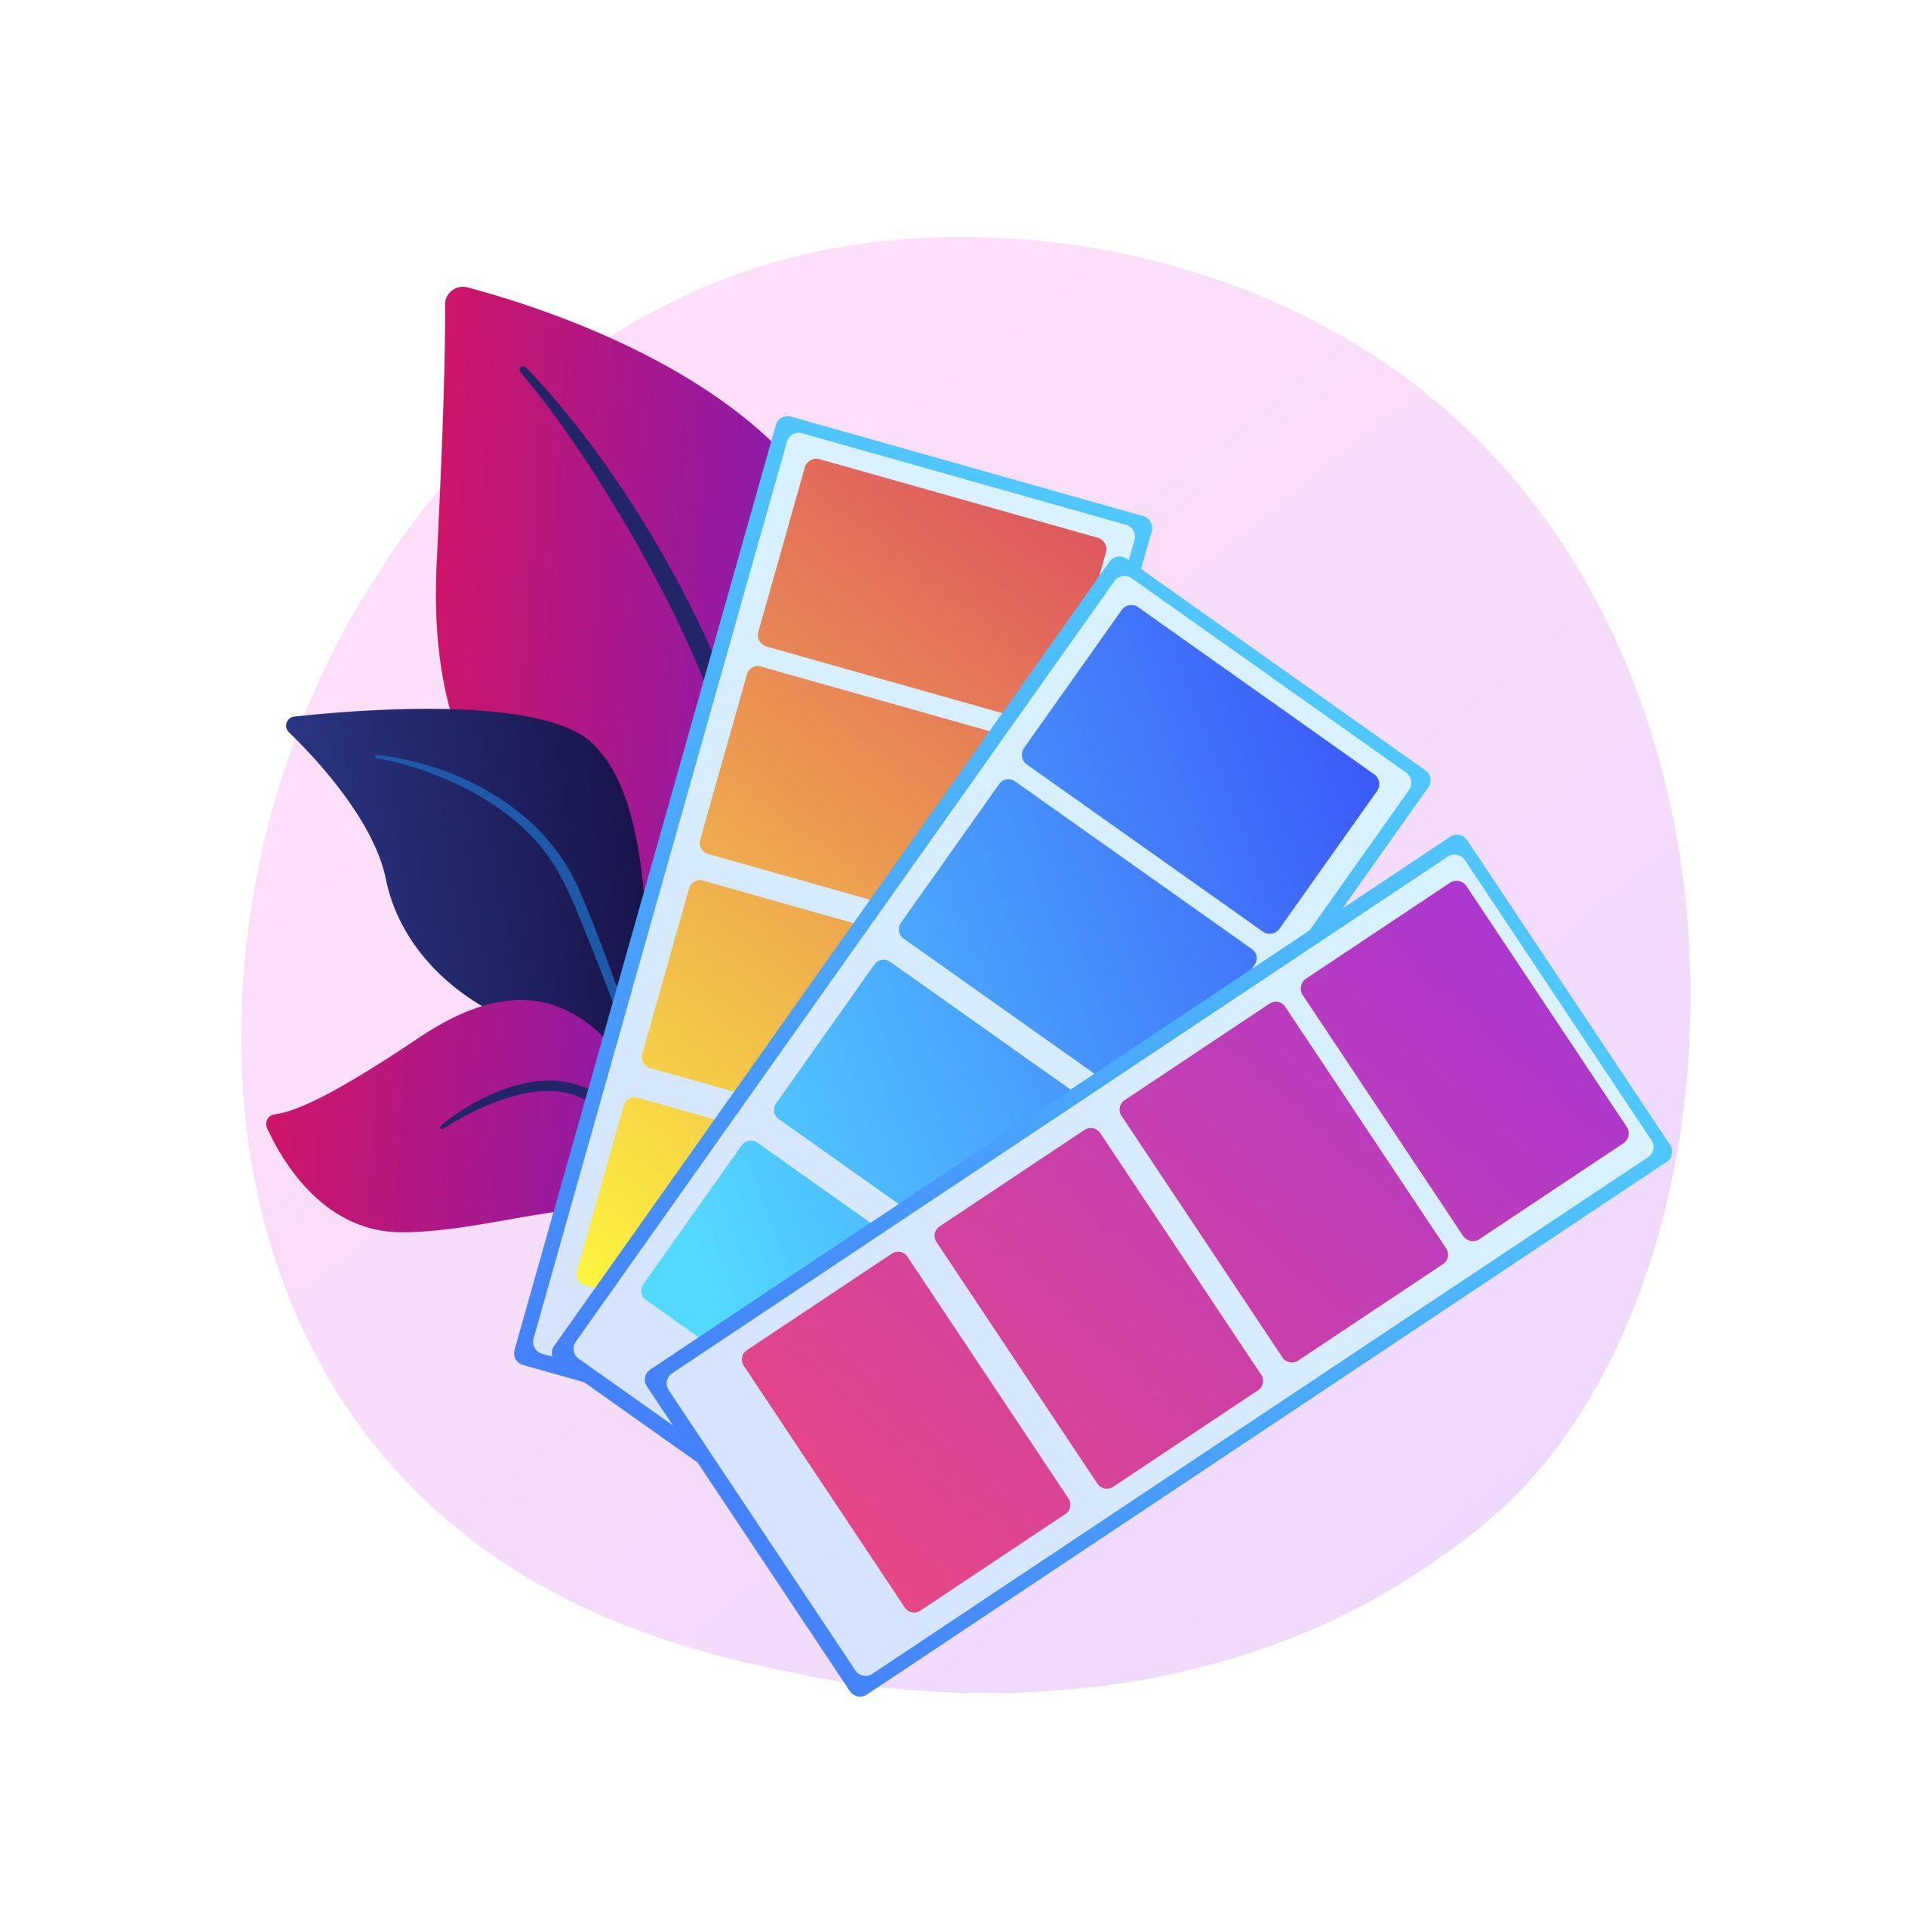 Colors swatches palette vector concept metaphor.